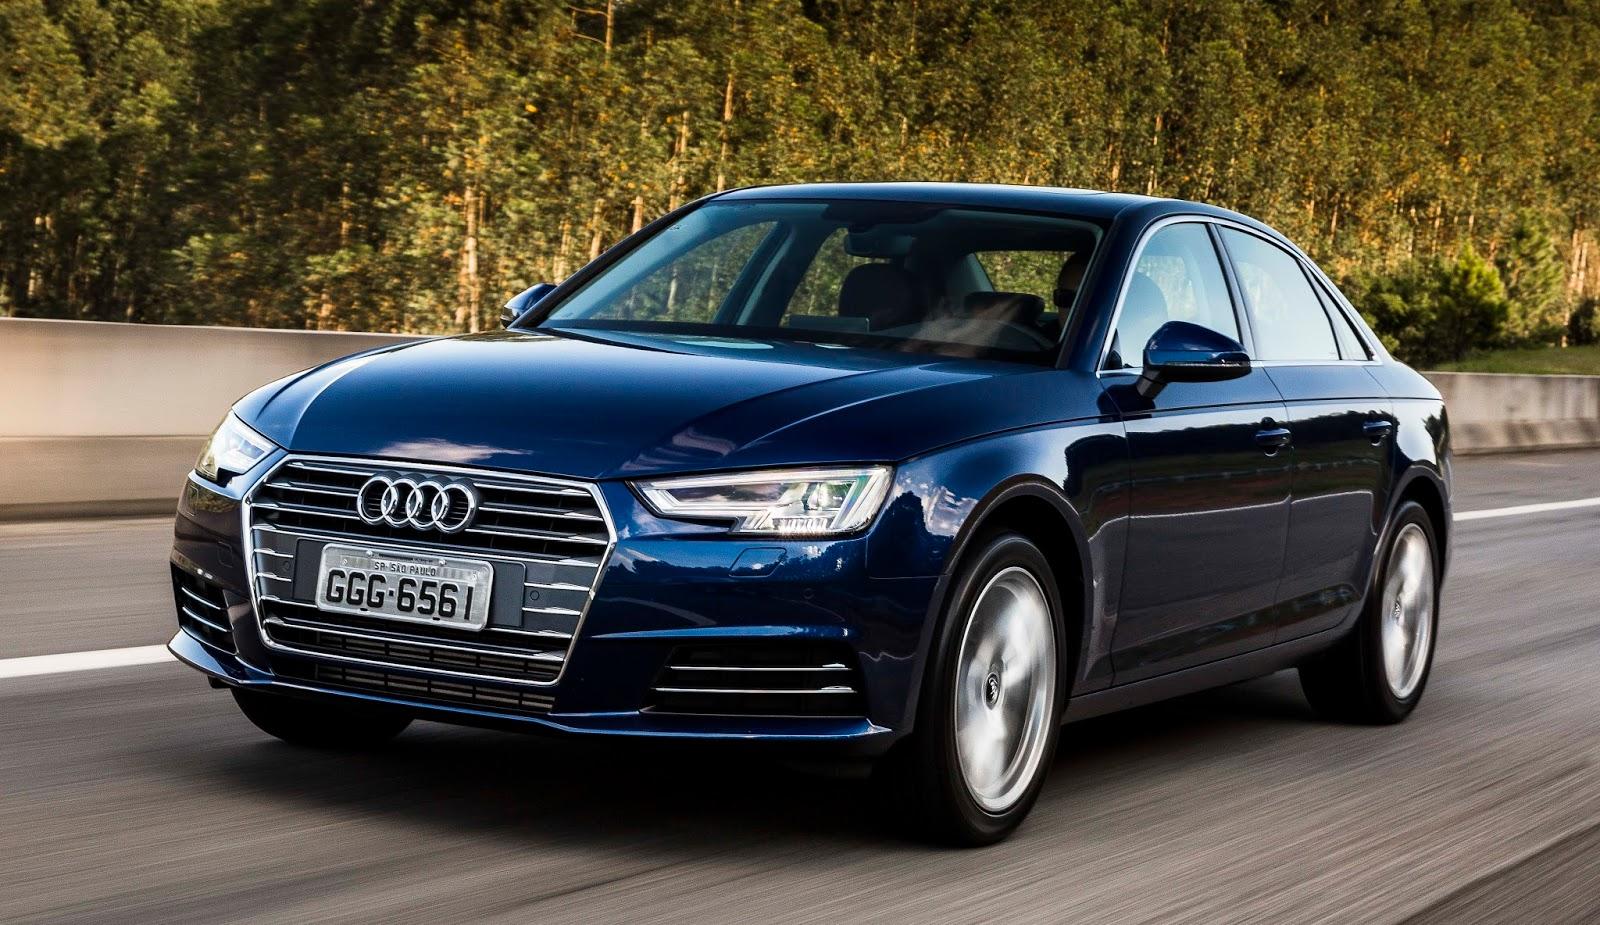 Audi a4 chega ao brasil totalmente repaginado